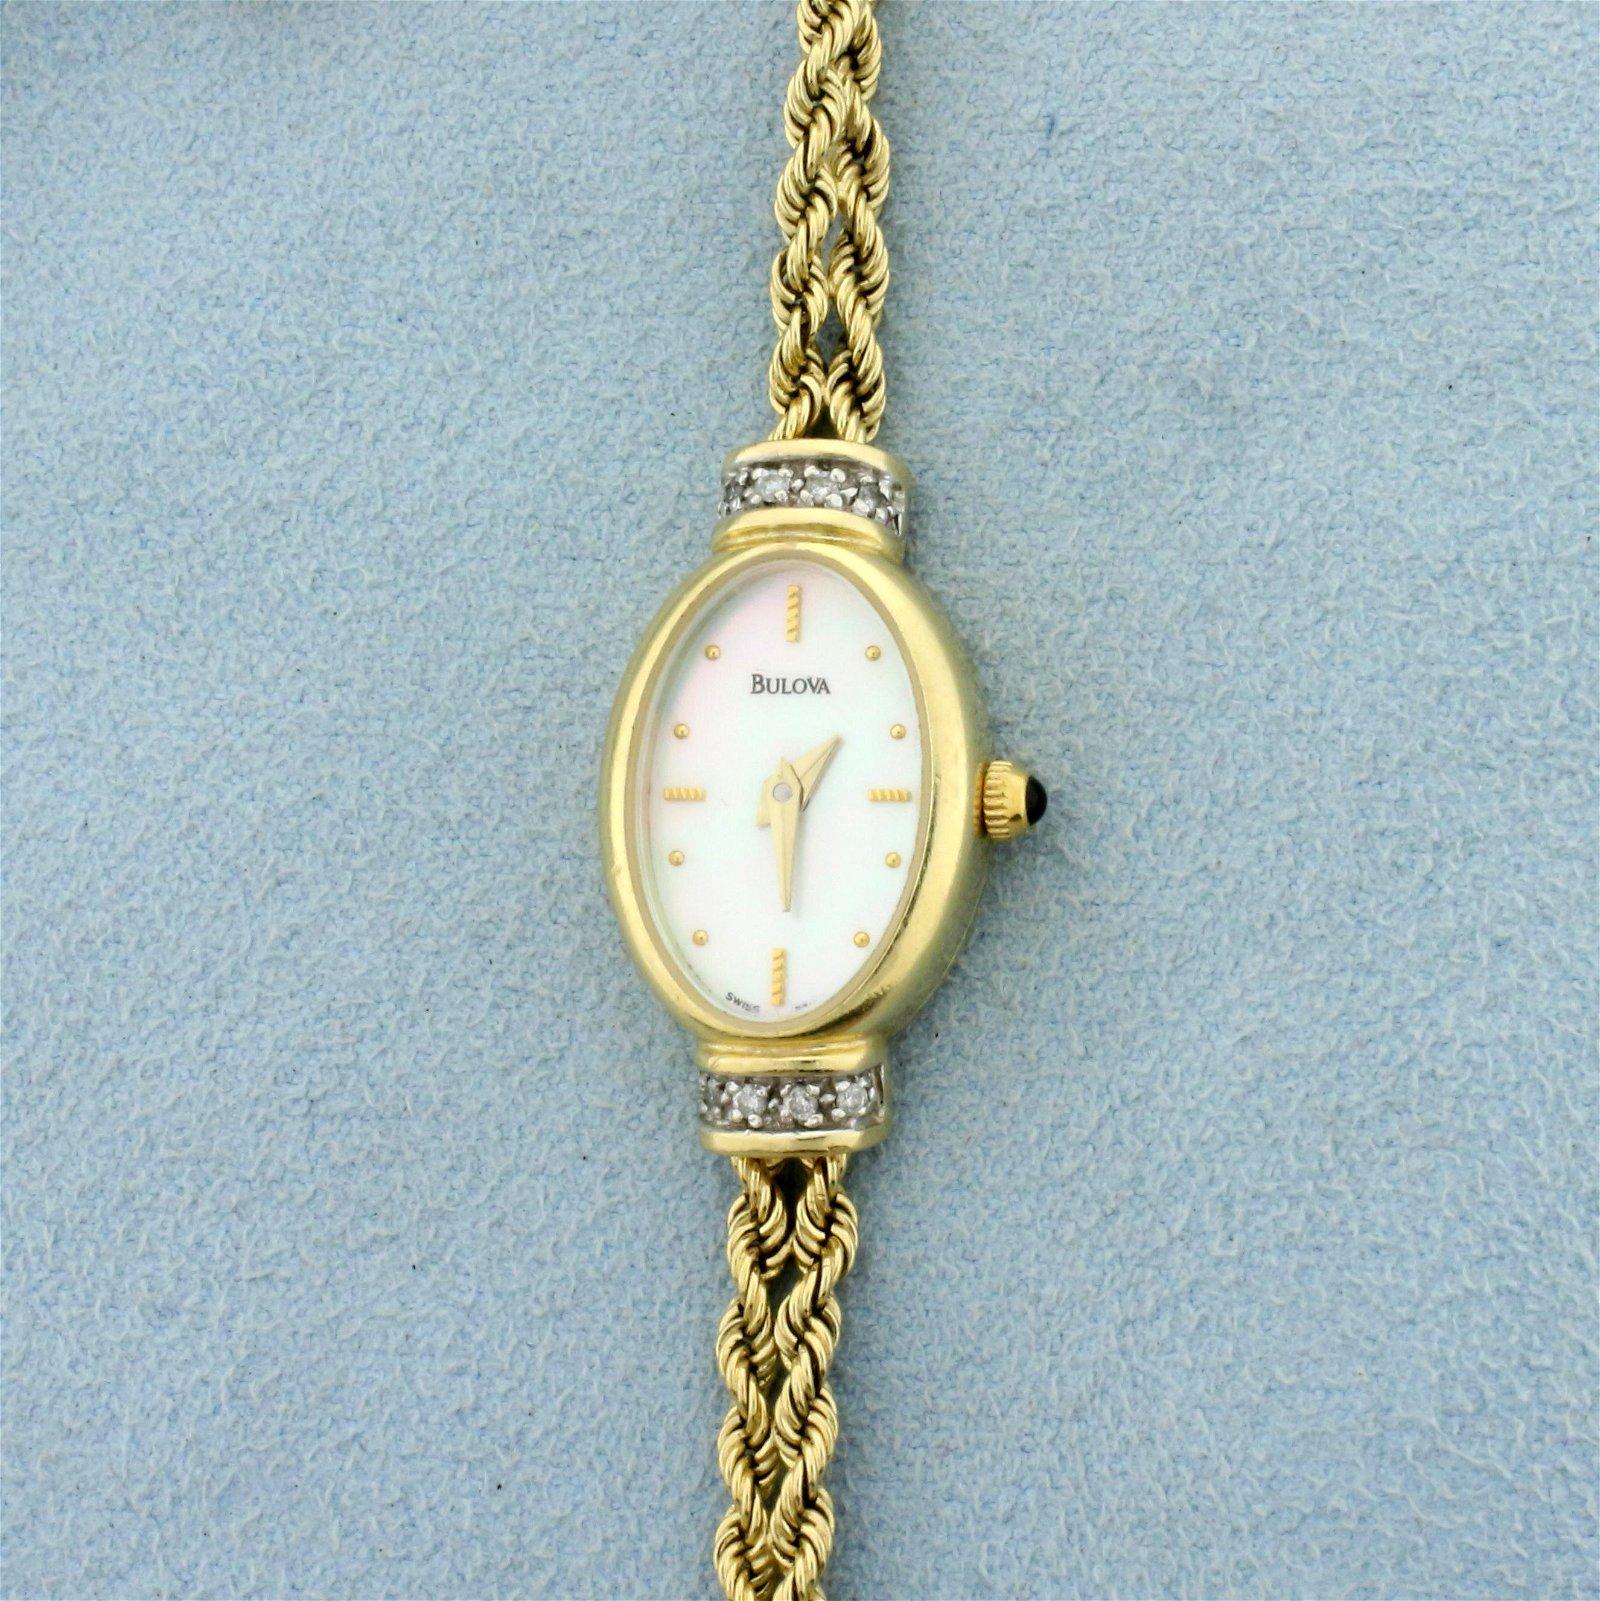 Bulova Diamond Rope Design Women's Watch in Solid 14K